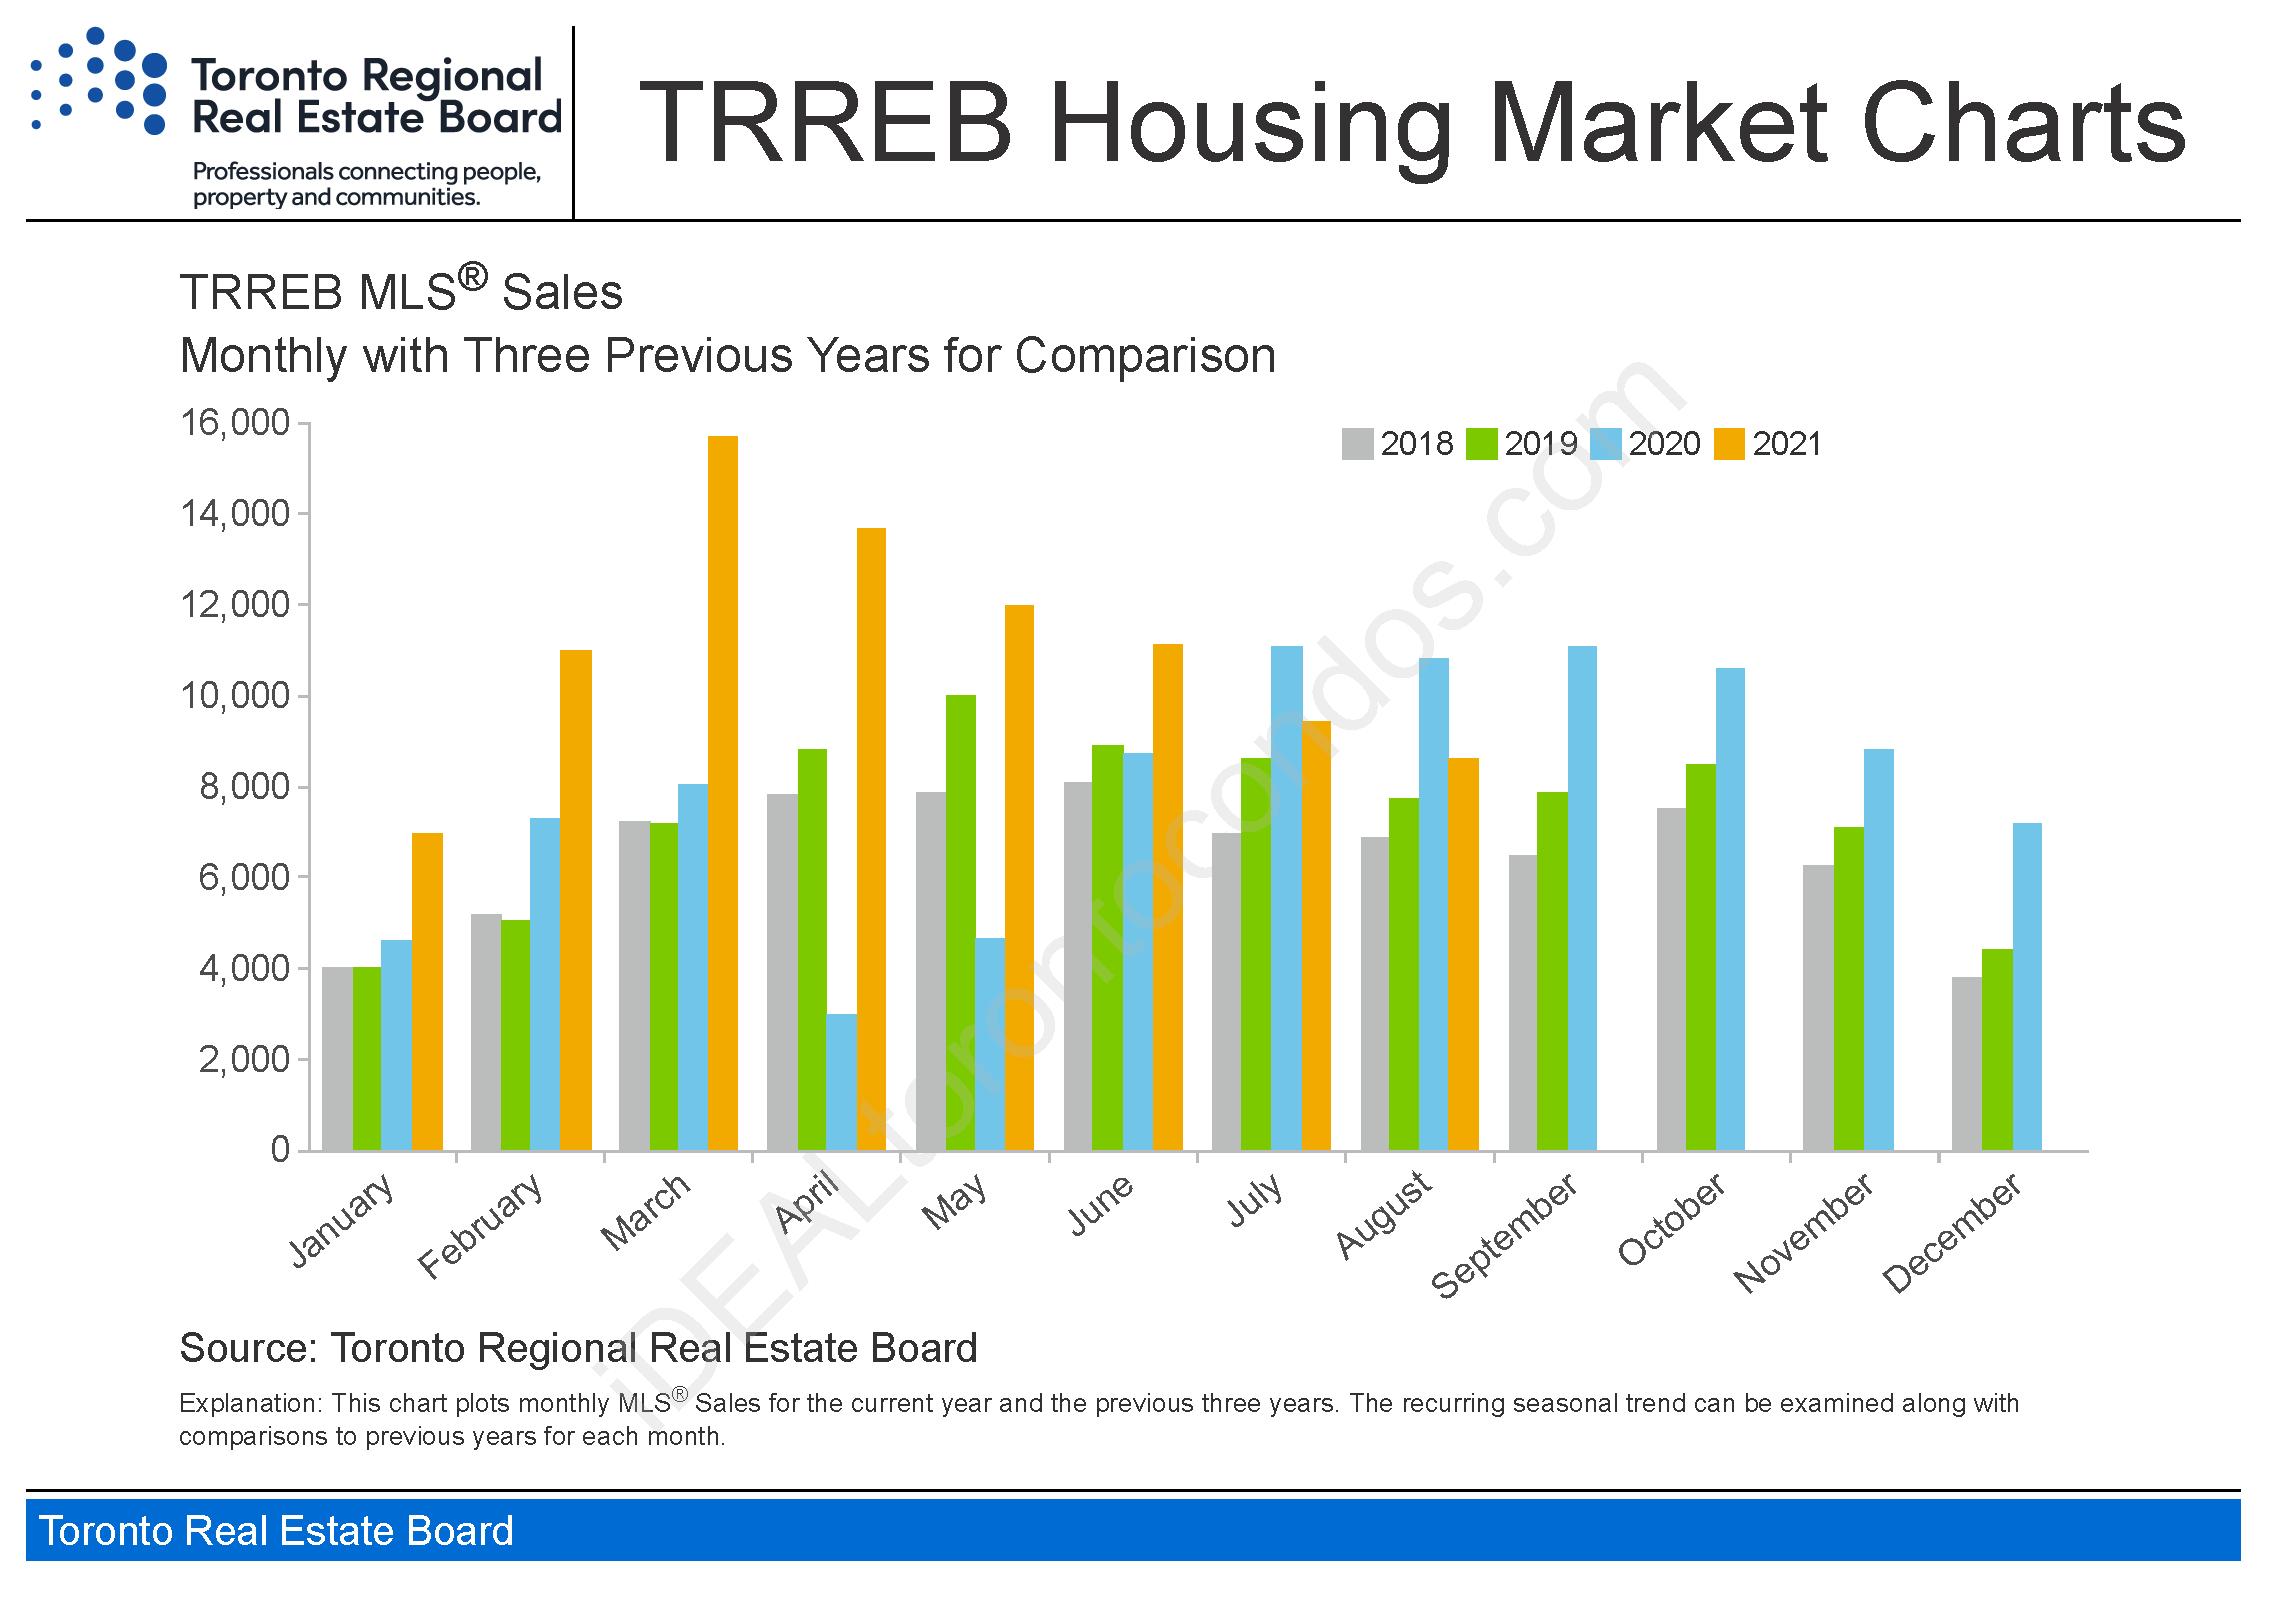 Toronto_housing-charts_TREB_Housing_Market_Charts-August2021